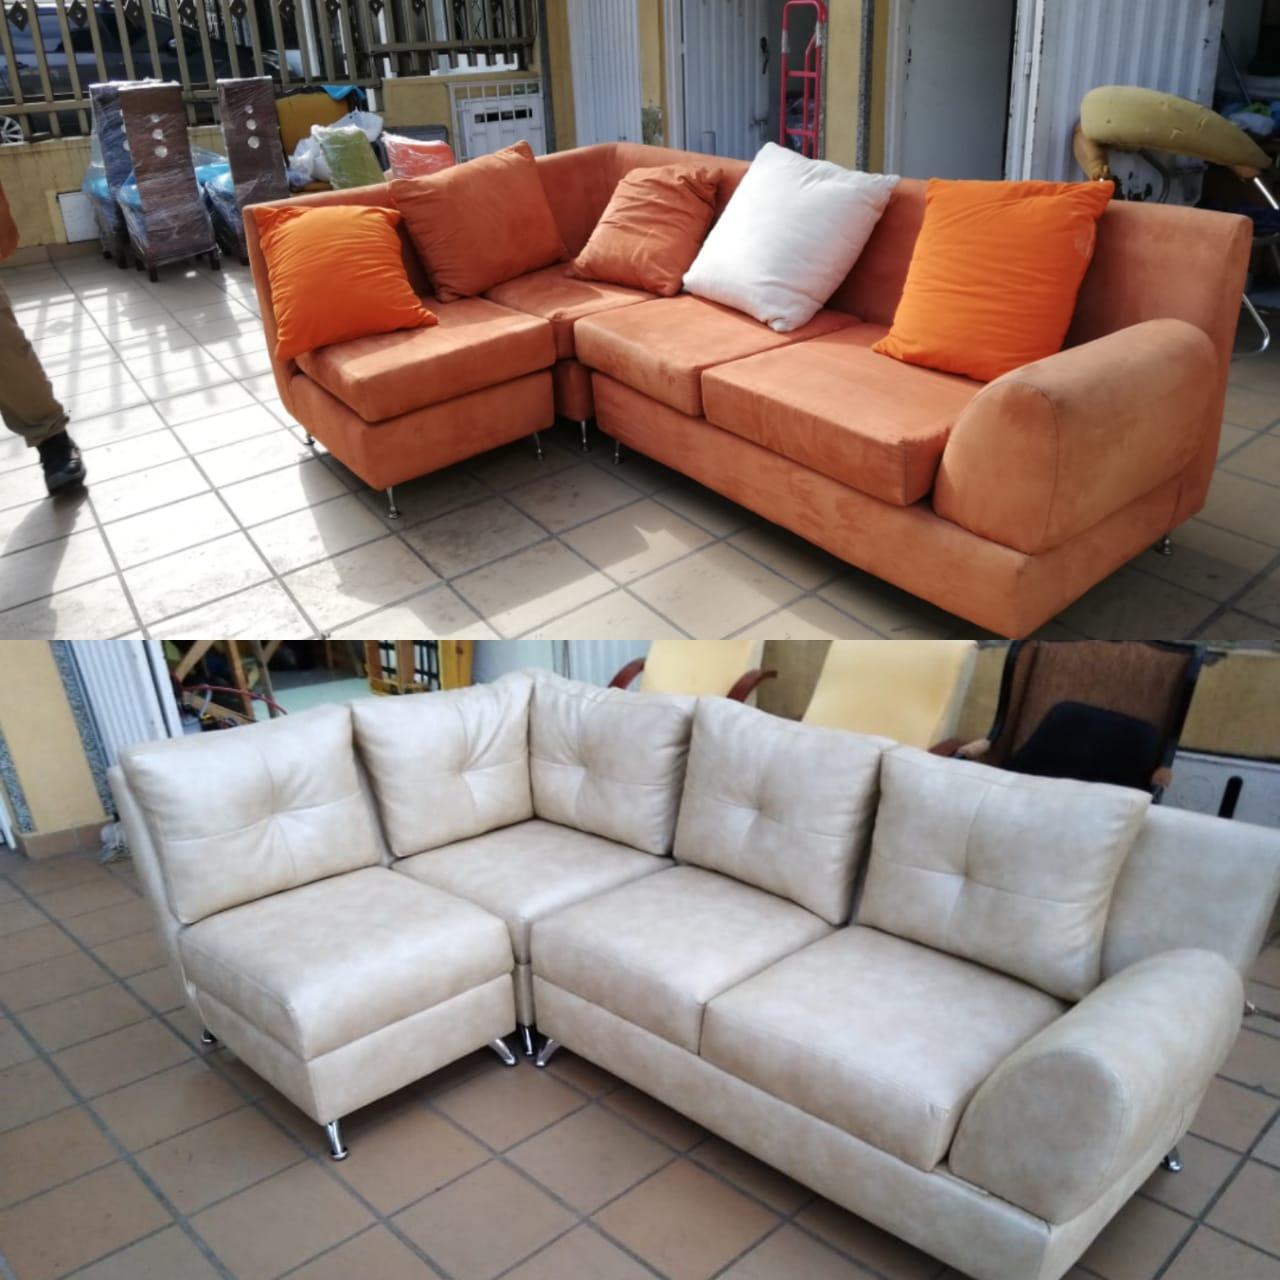 Cambio de tela a muebles cali